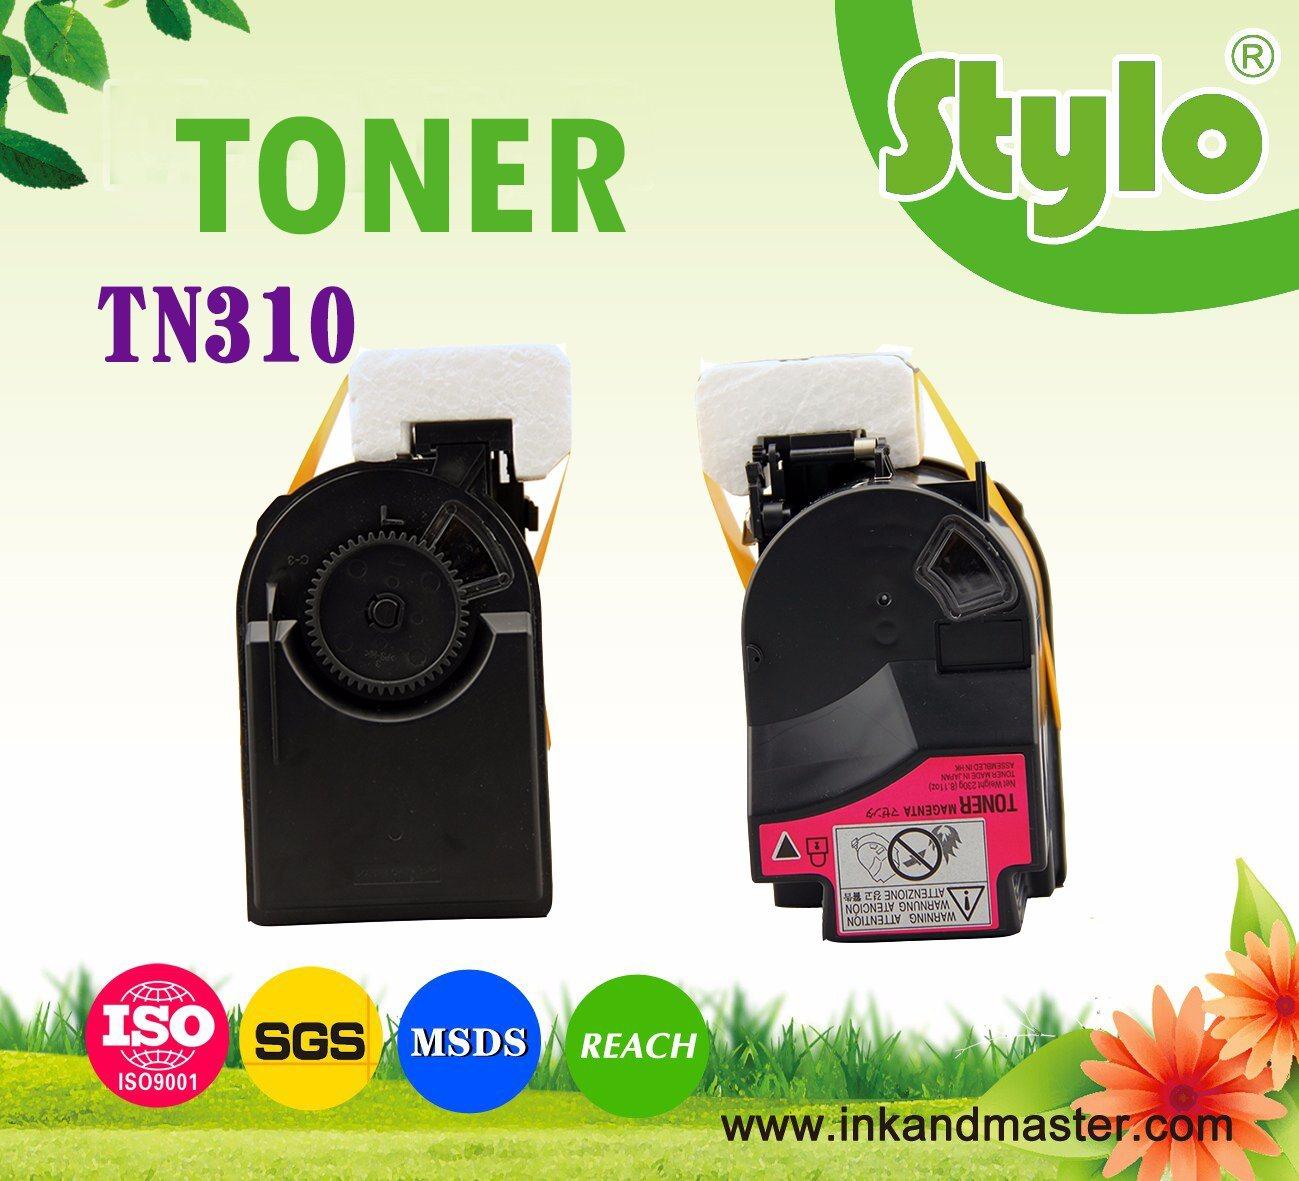 Tn-310 Printer Toner Cartridge